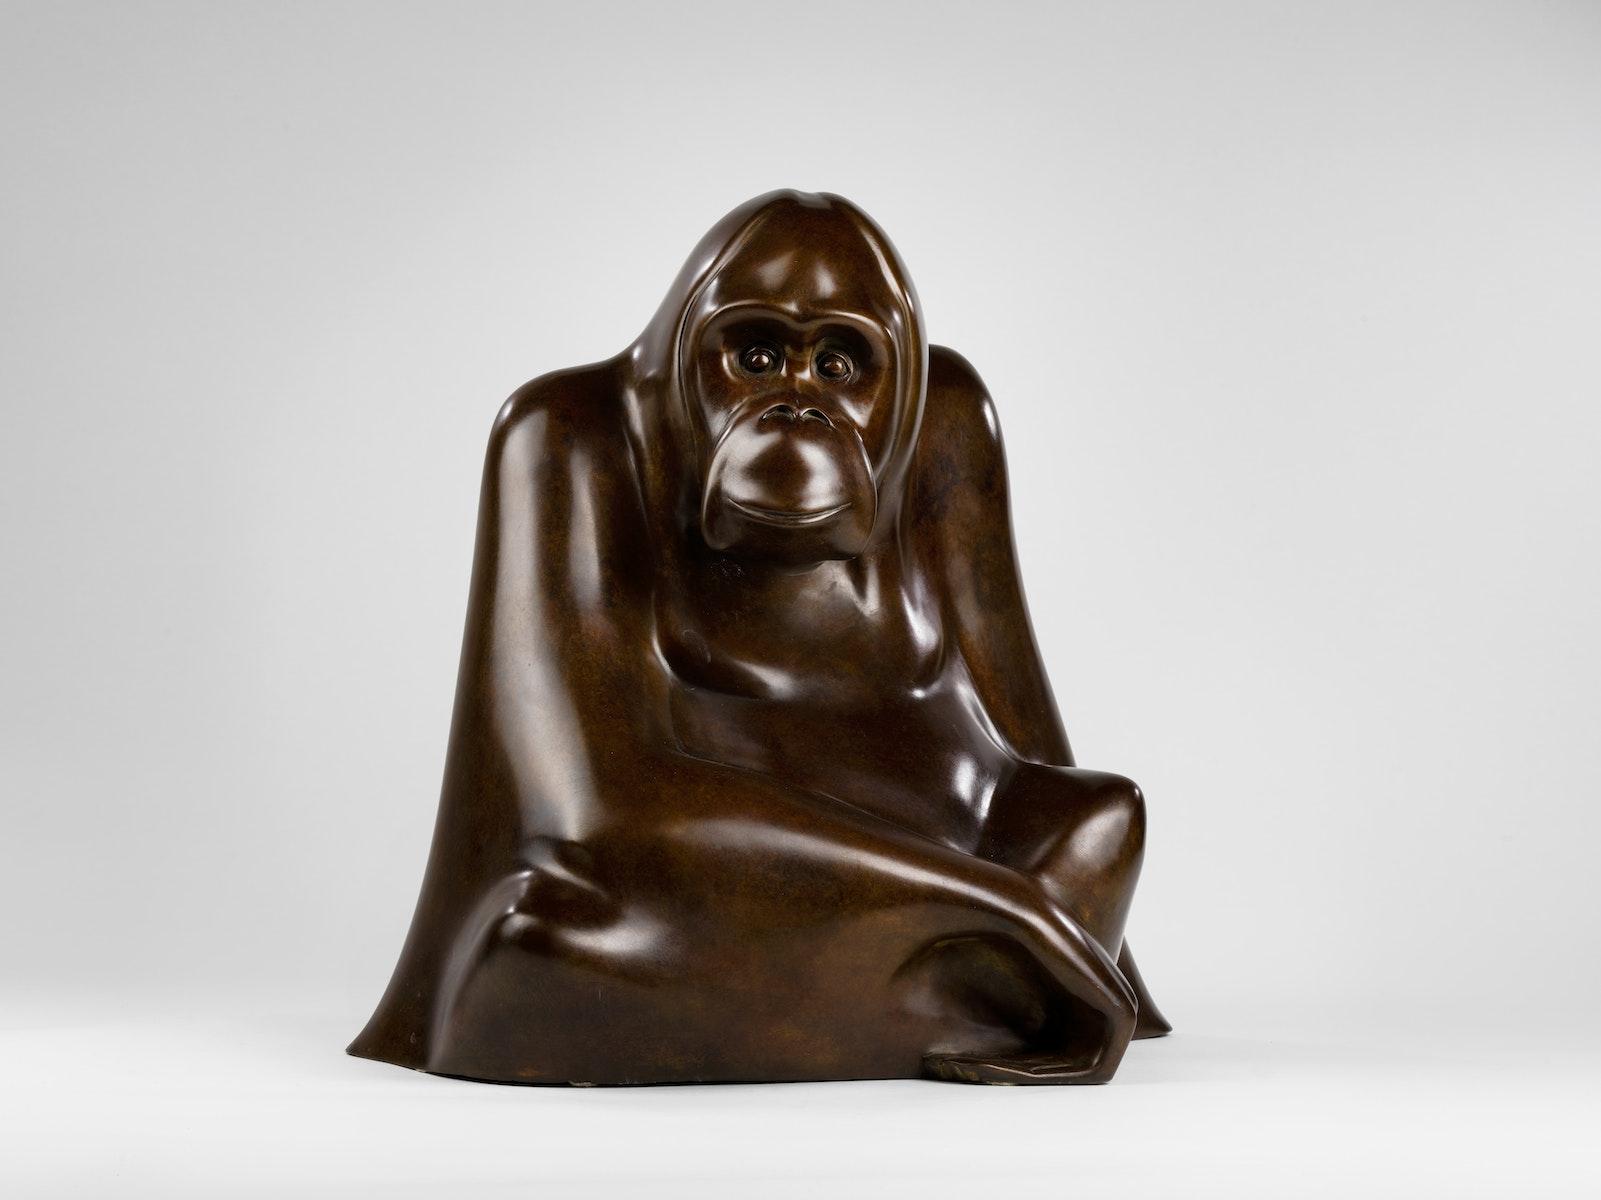 Jonathan Knight, Animalier, United Kingdom, Bronze, Orangutan